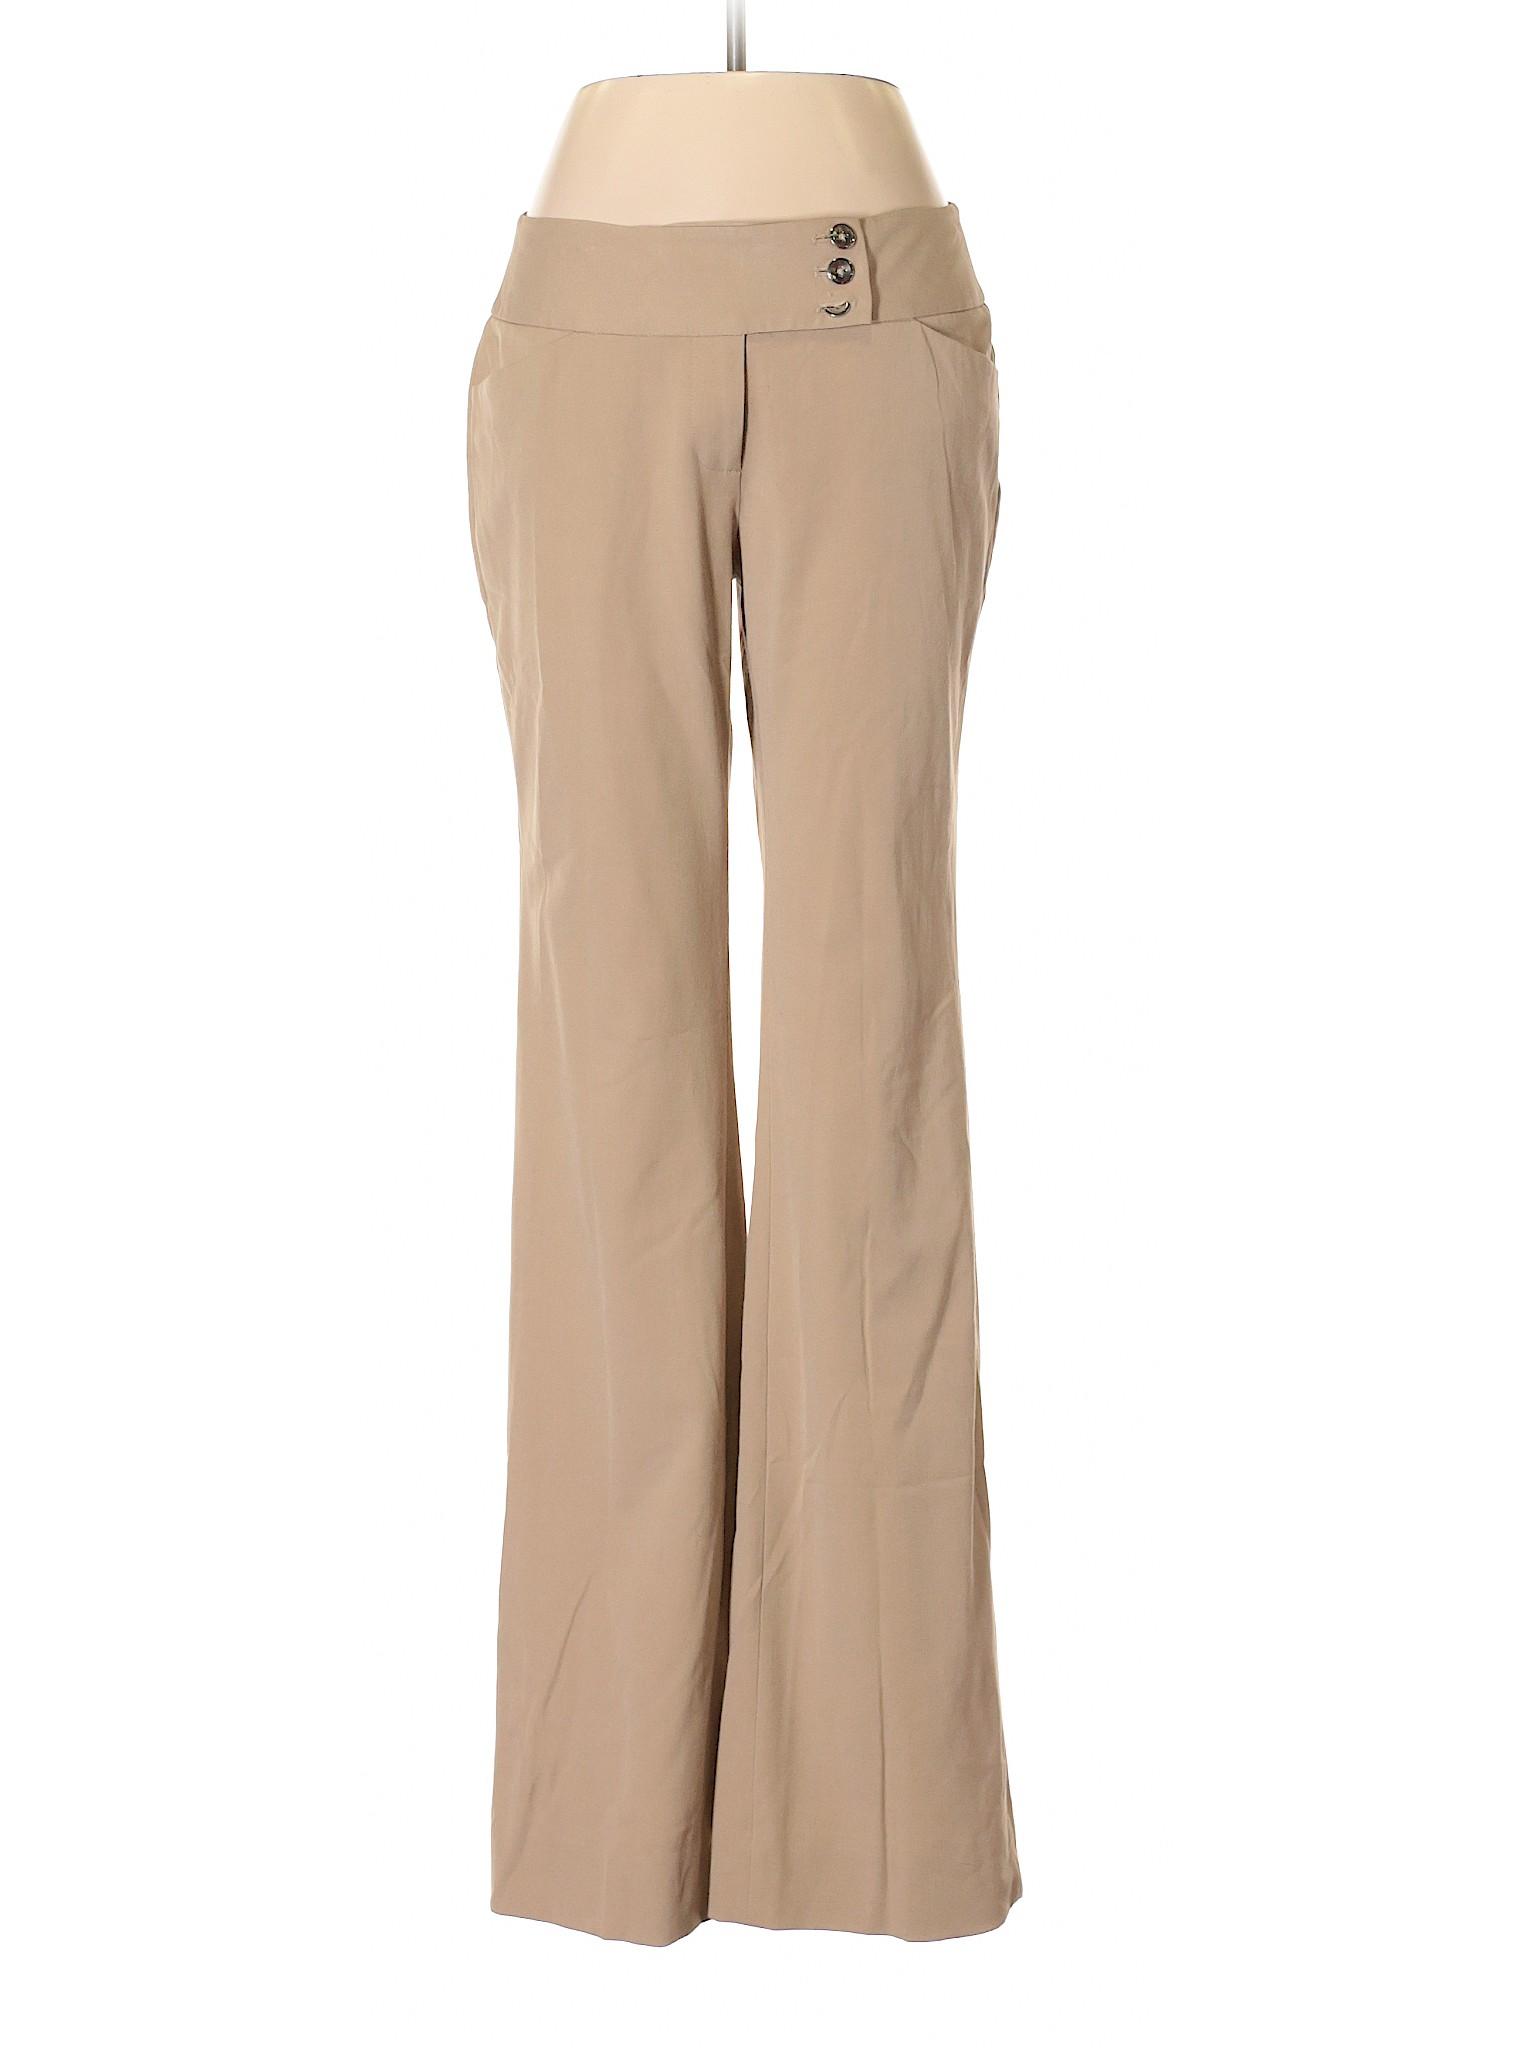 Dress Black House Market leisure White Pants Boutique EwtFXqBxx